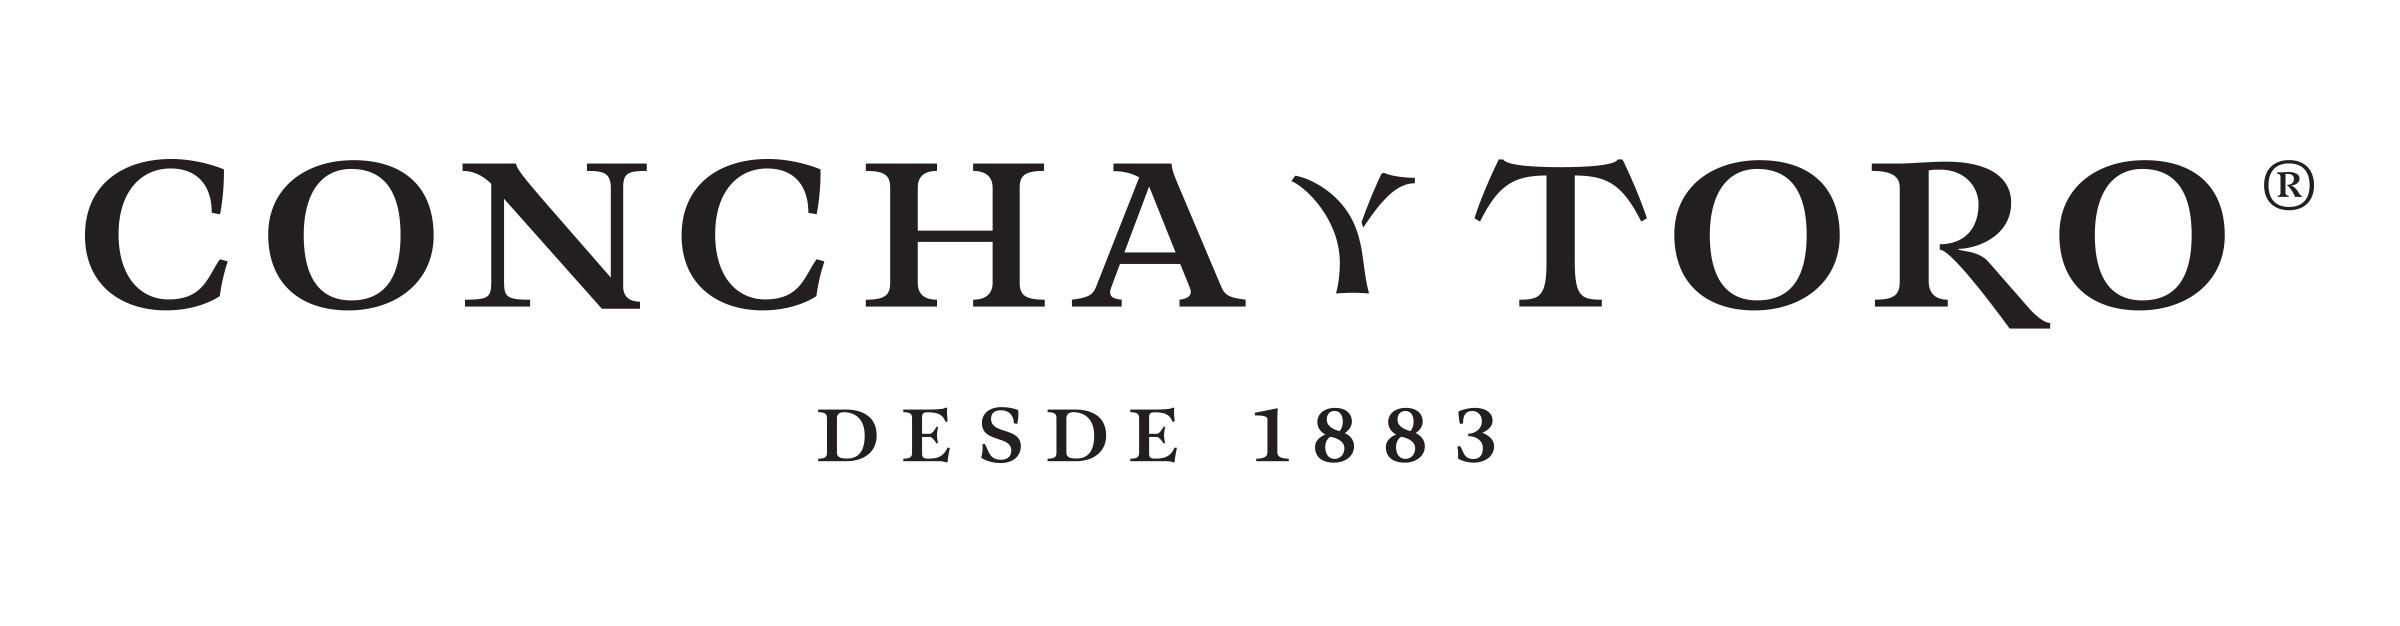 Concha_y_Toro_Logo.jpg